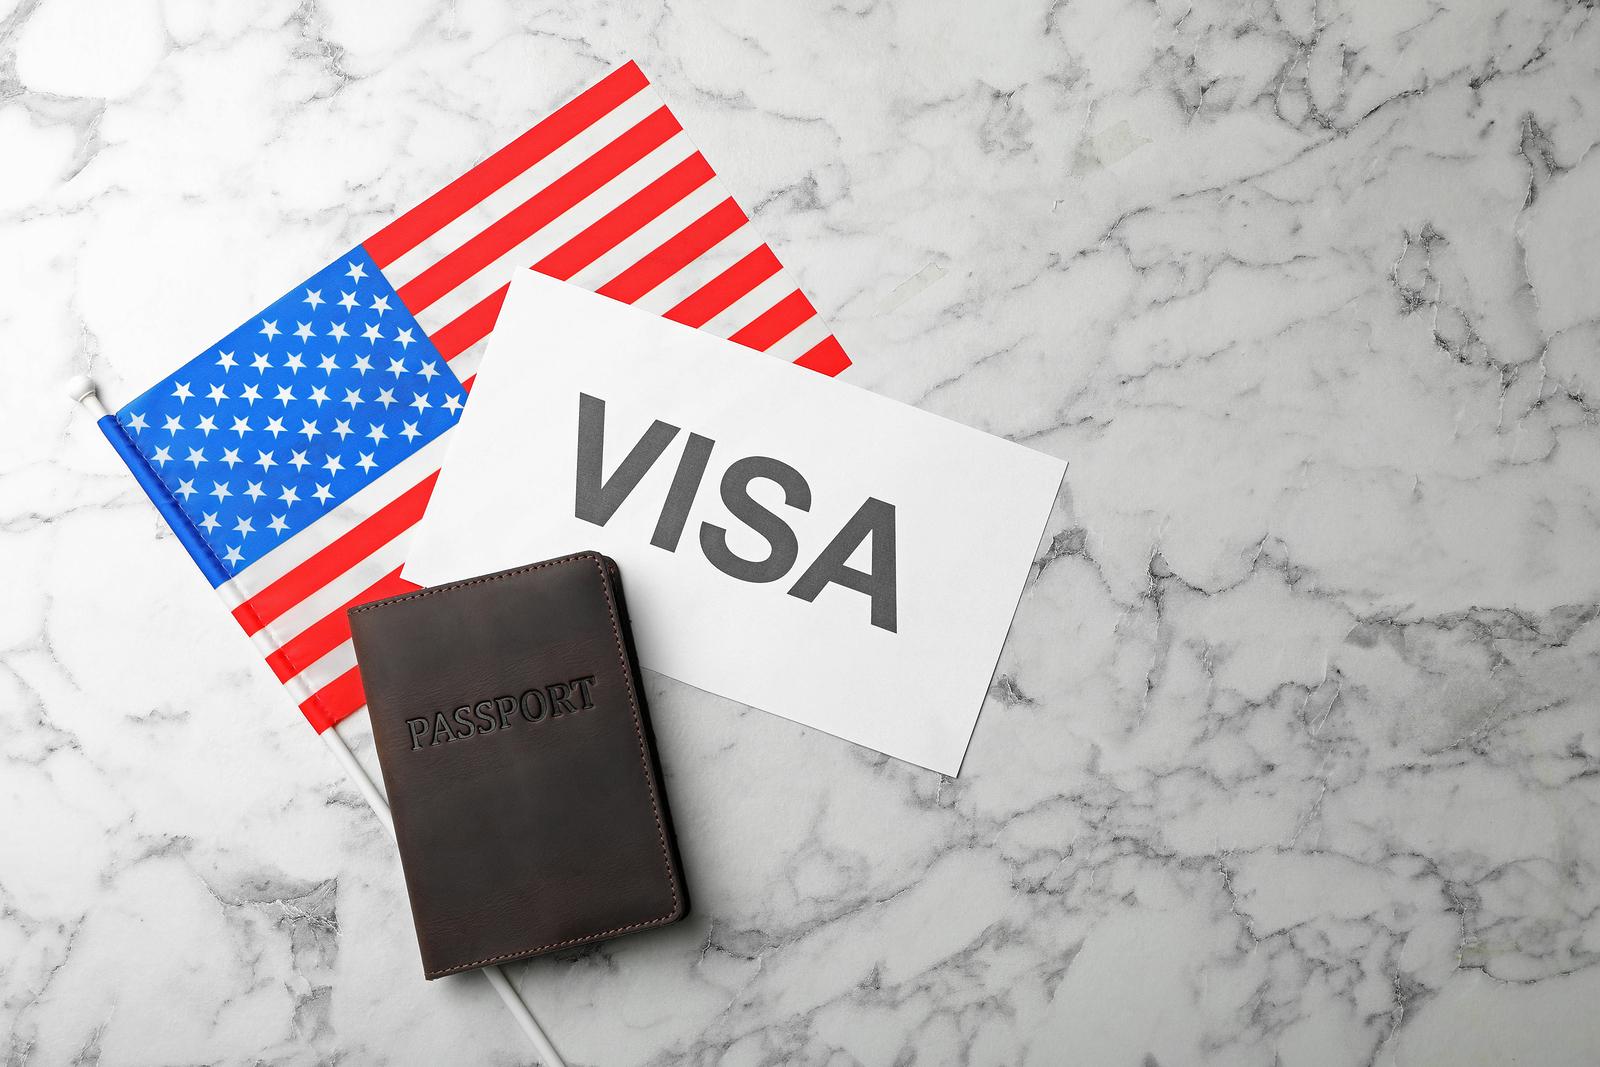 USA passport and VISA